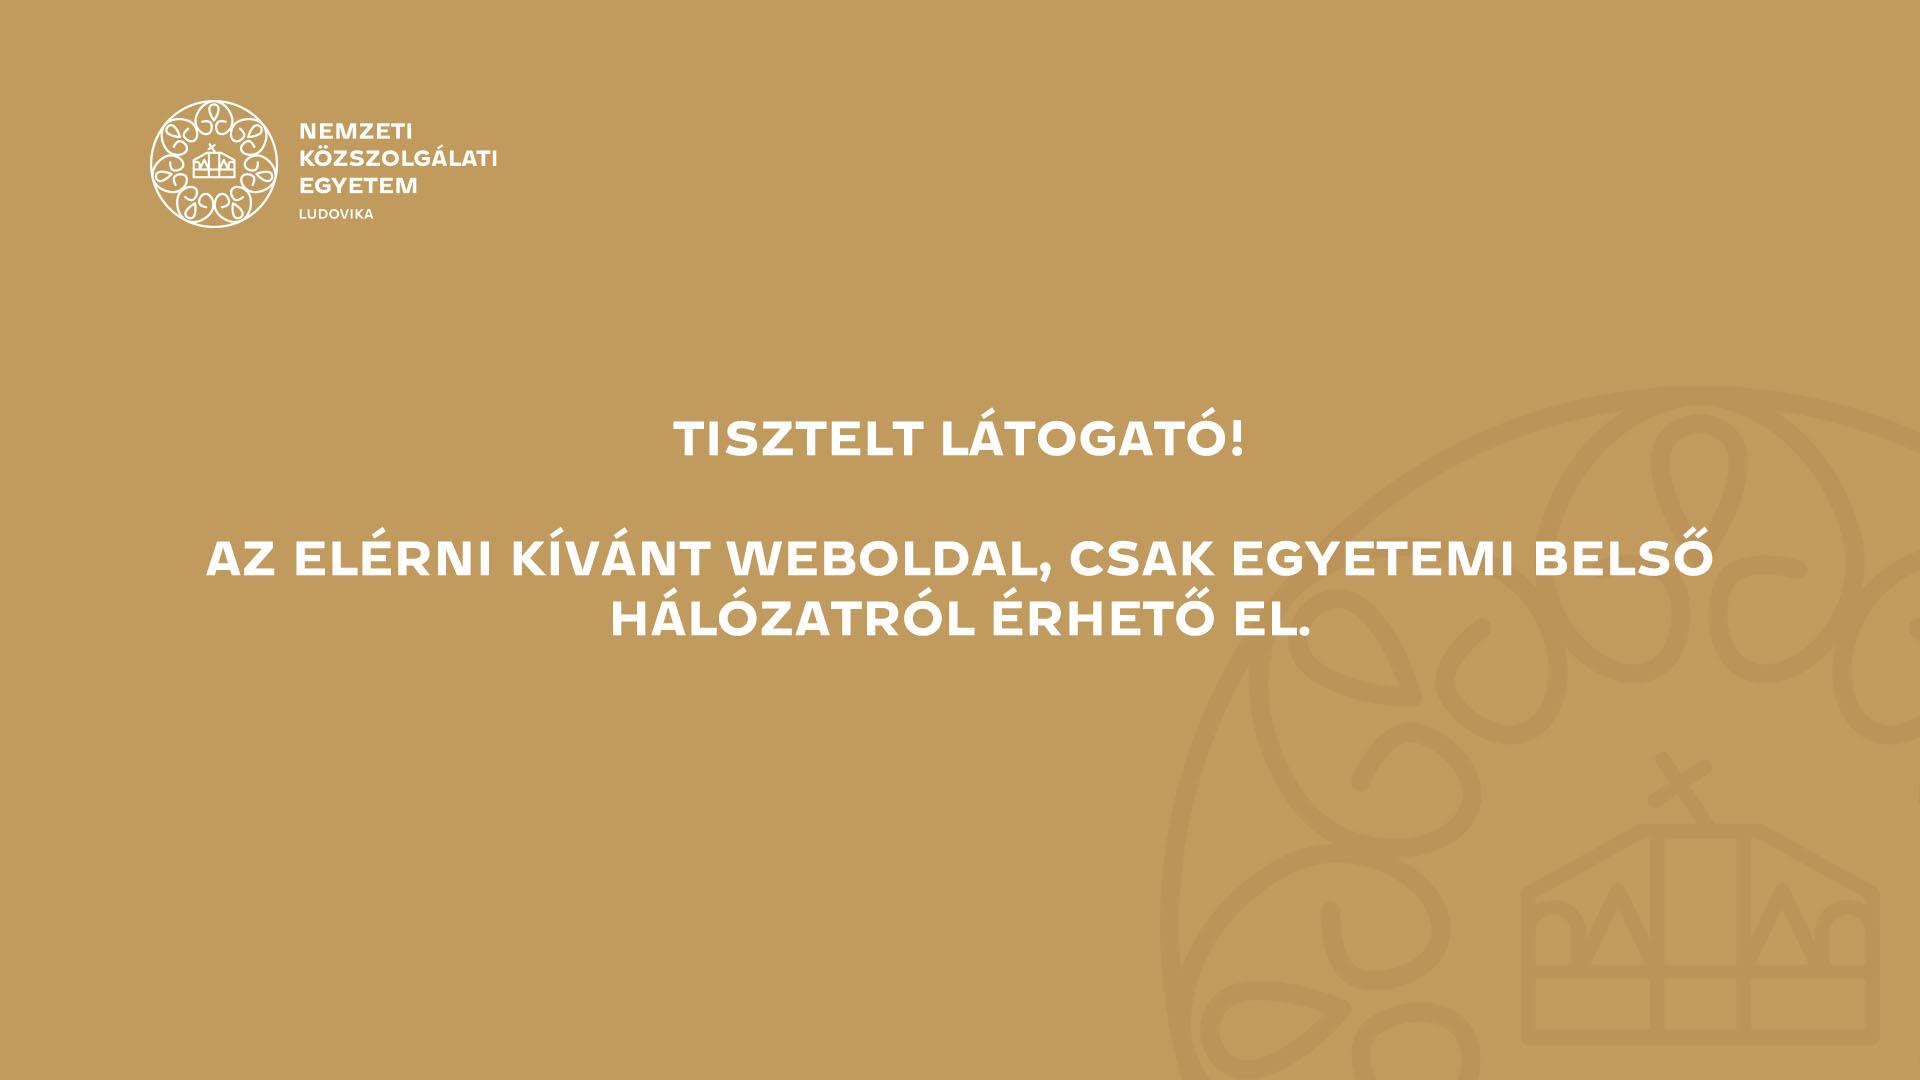 Dr. Gubicza József tű. ezredes PhD.